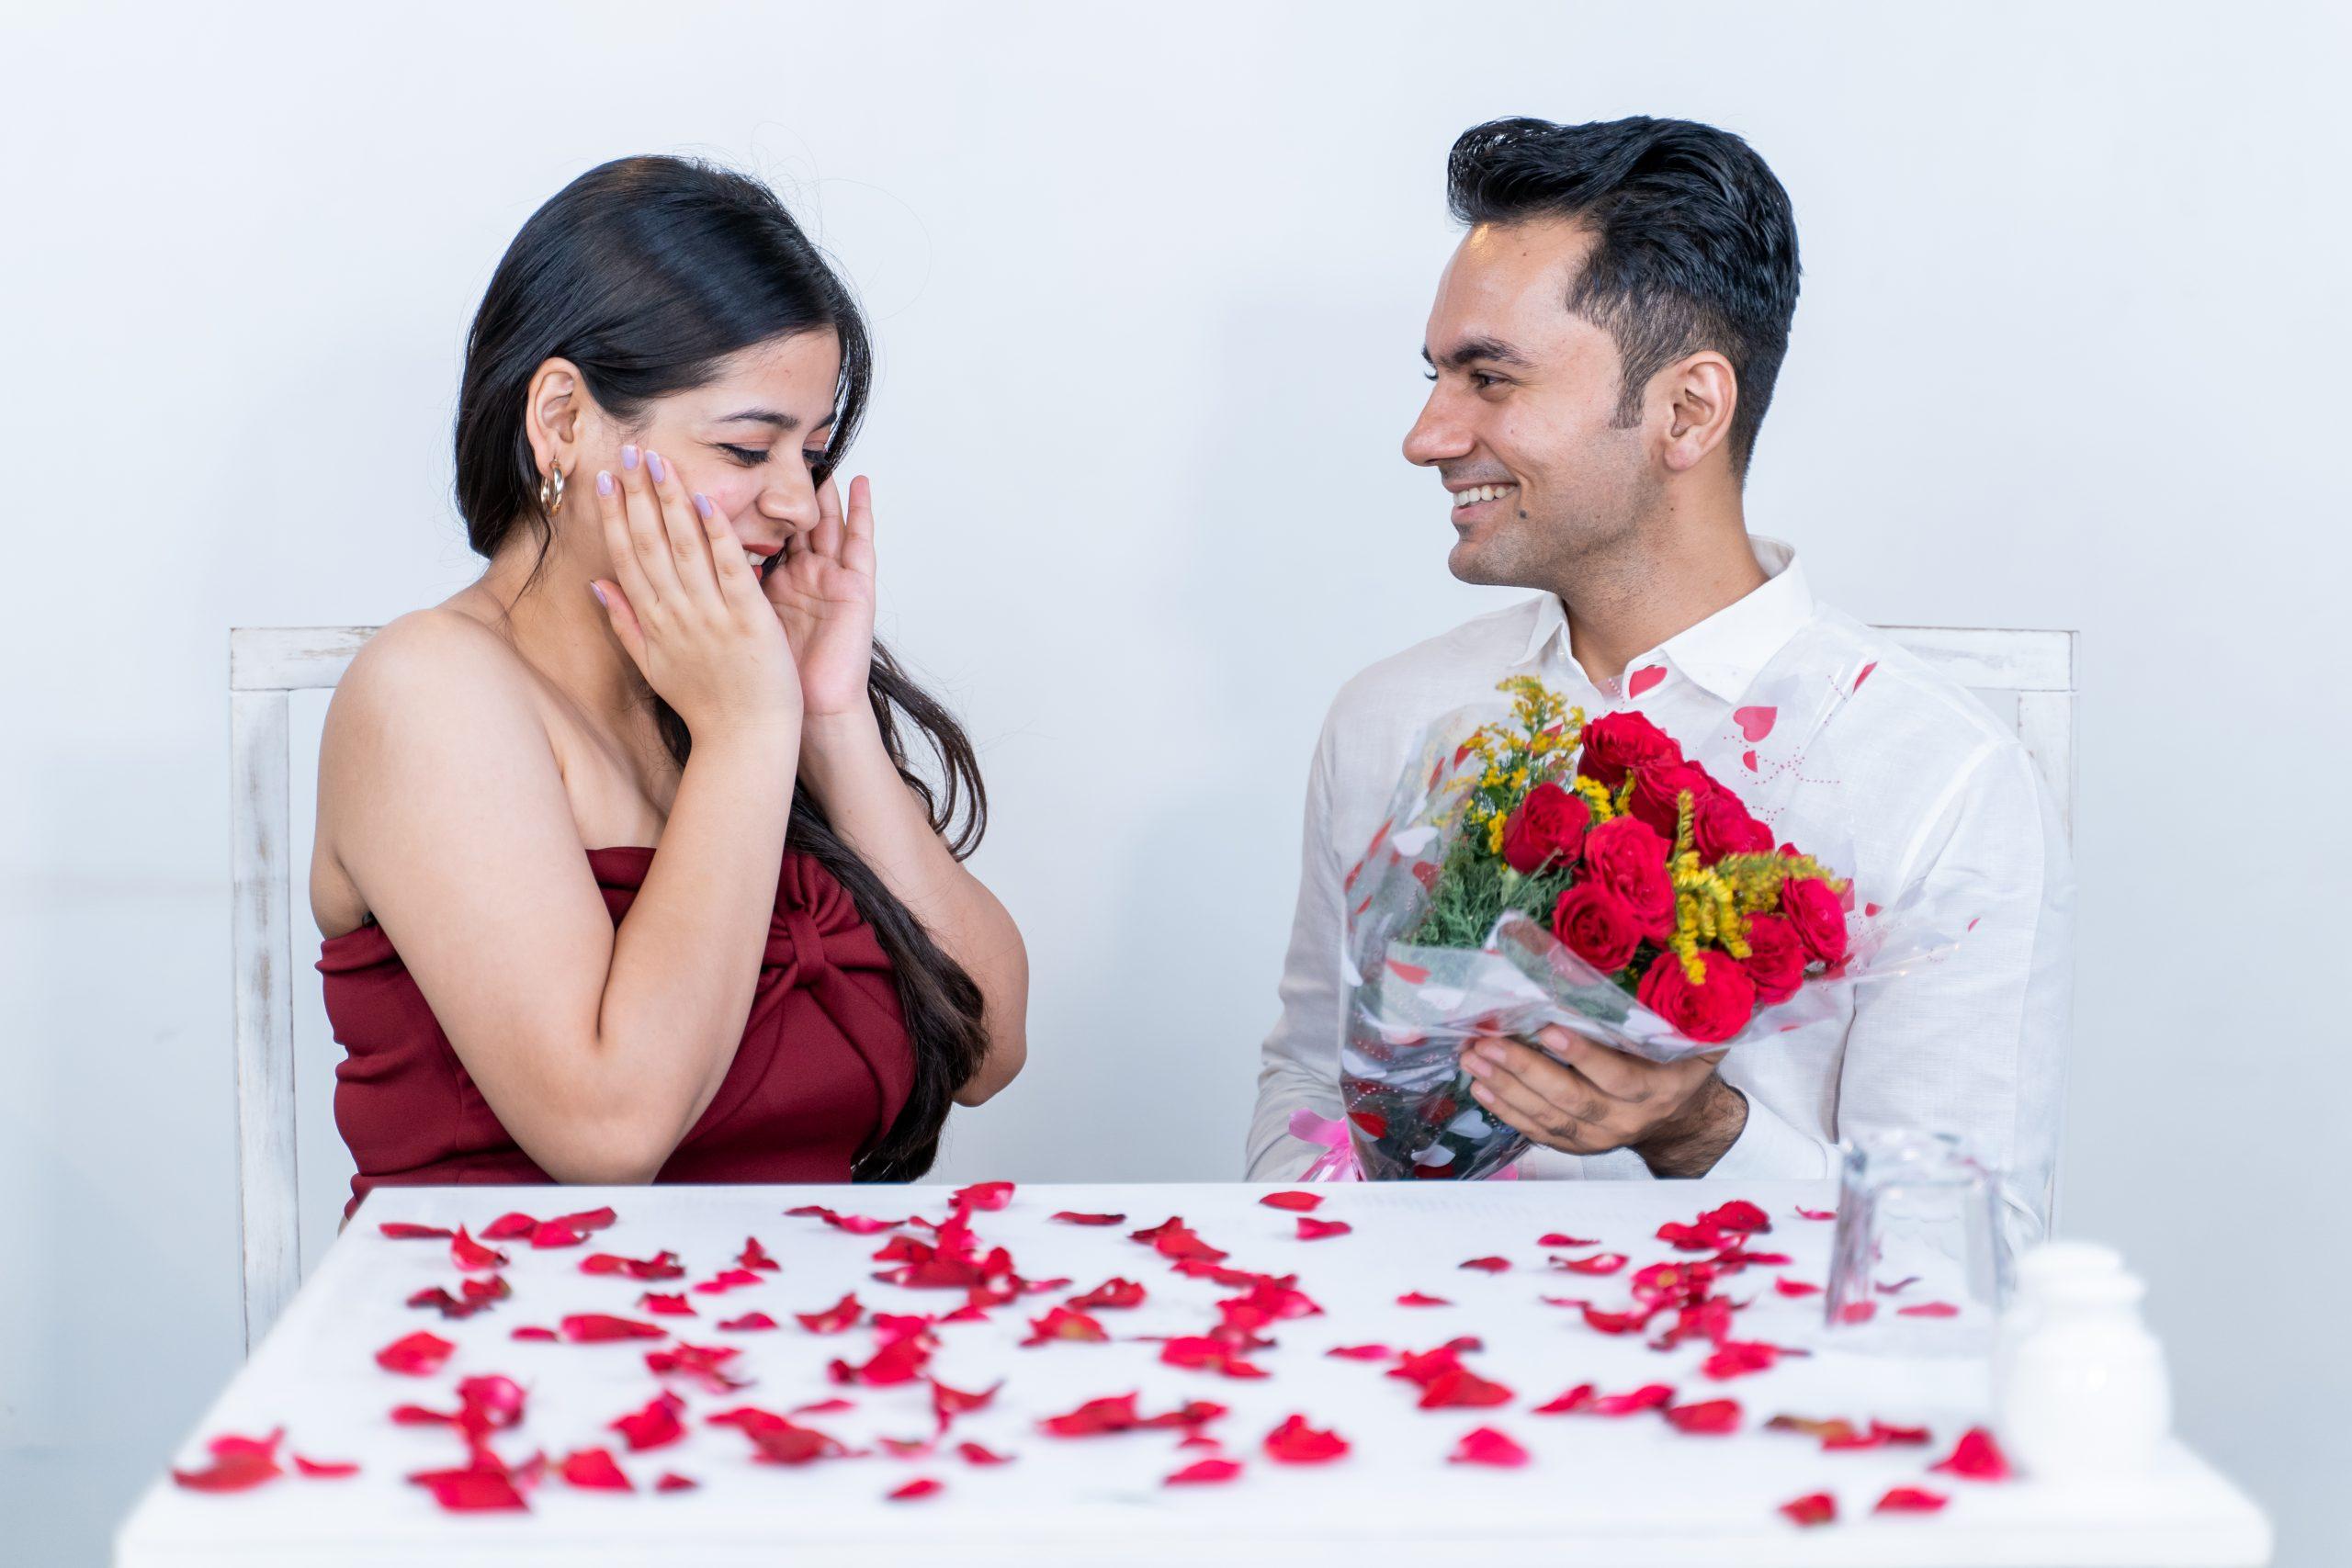 Boy surprising girlfriend with flowers